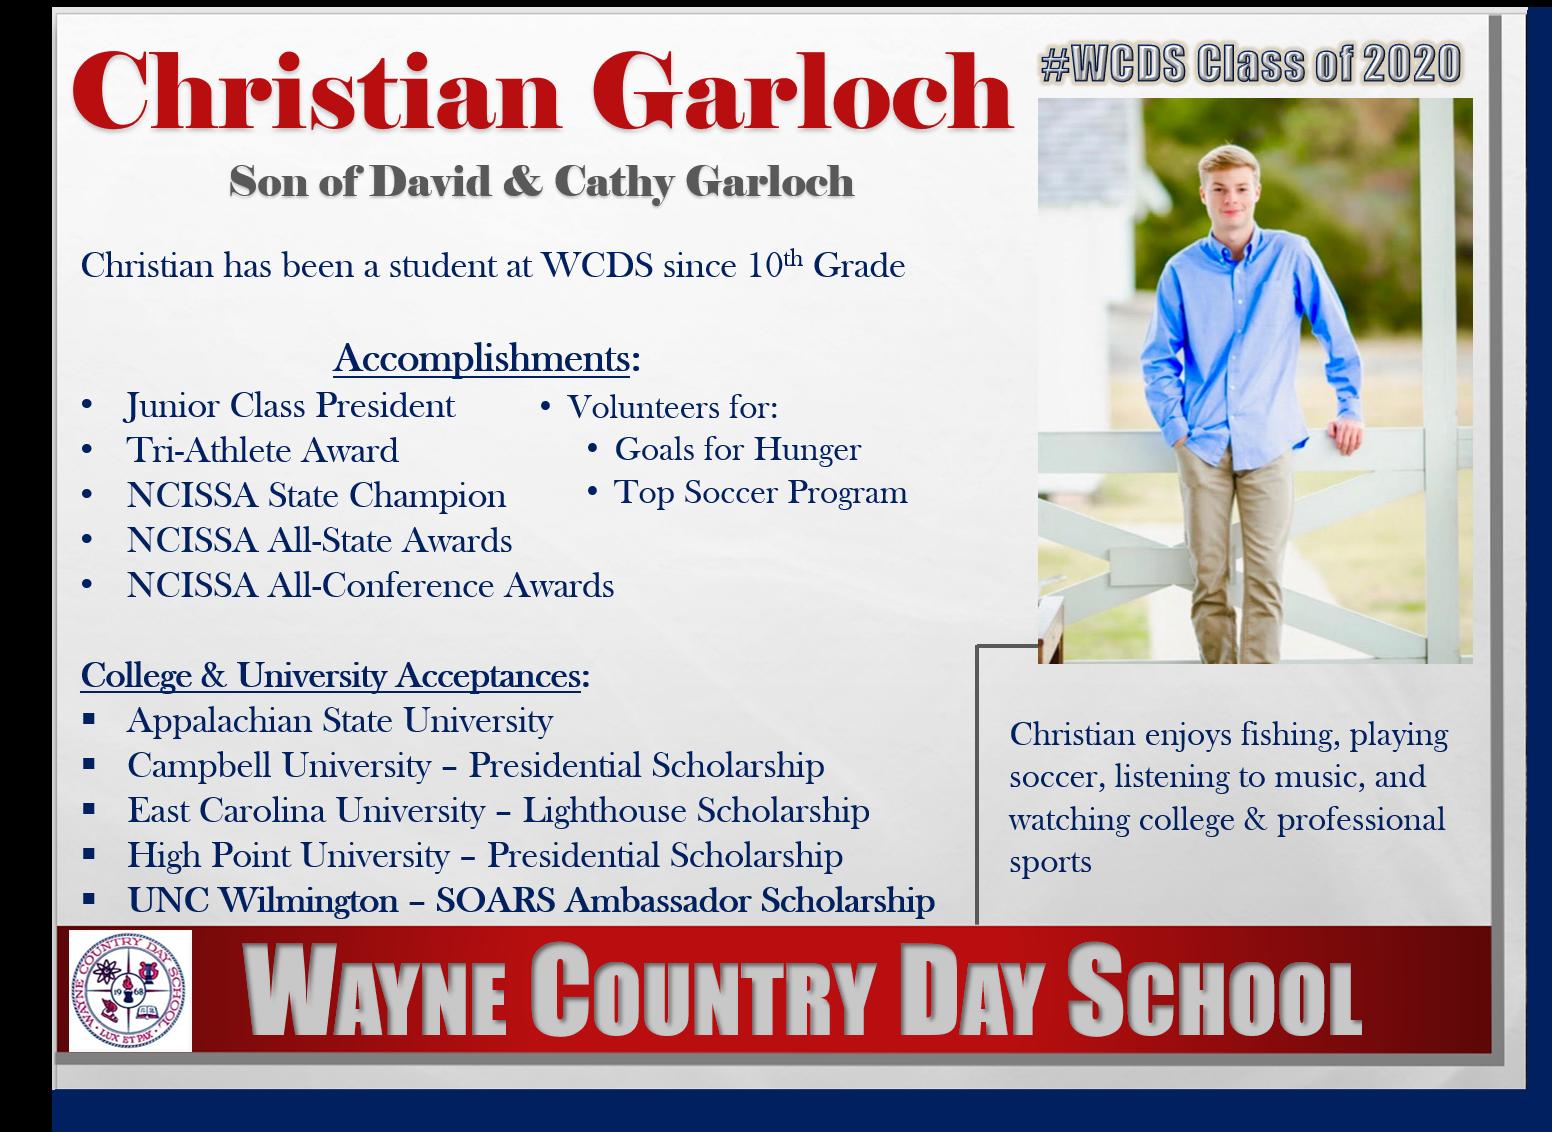 Christian Garloch Profile